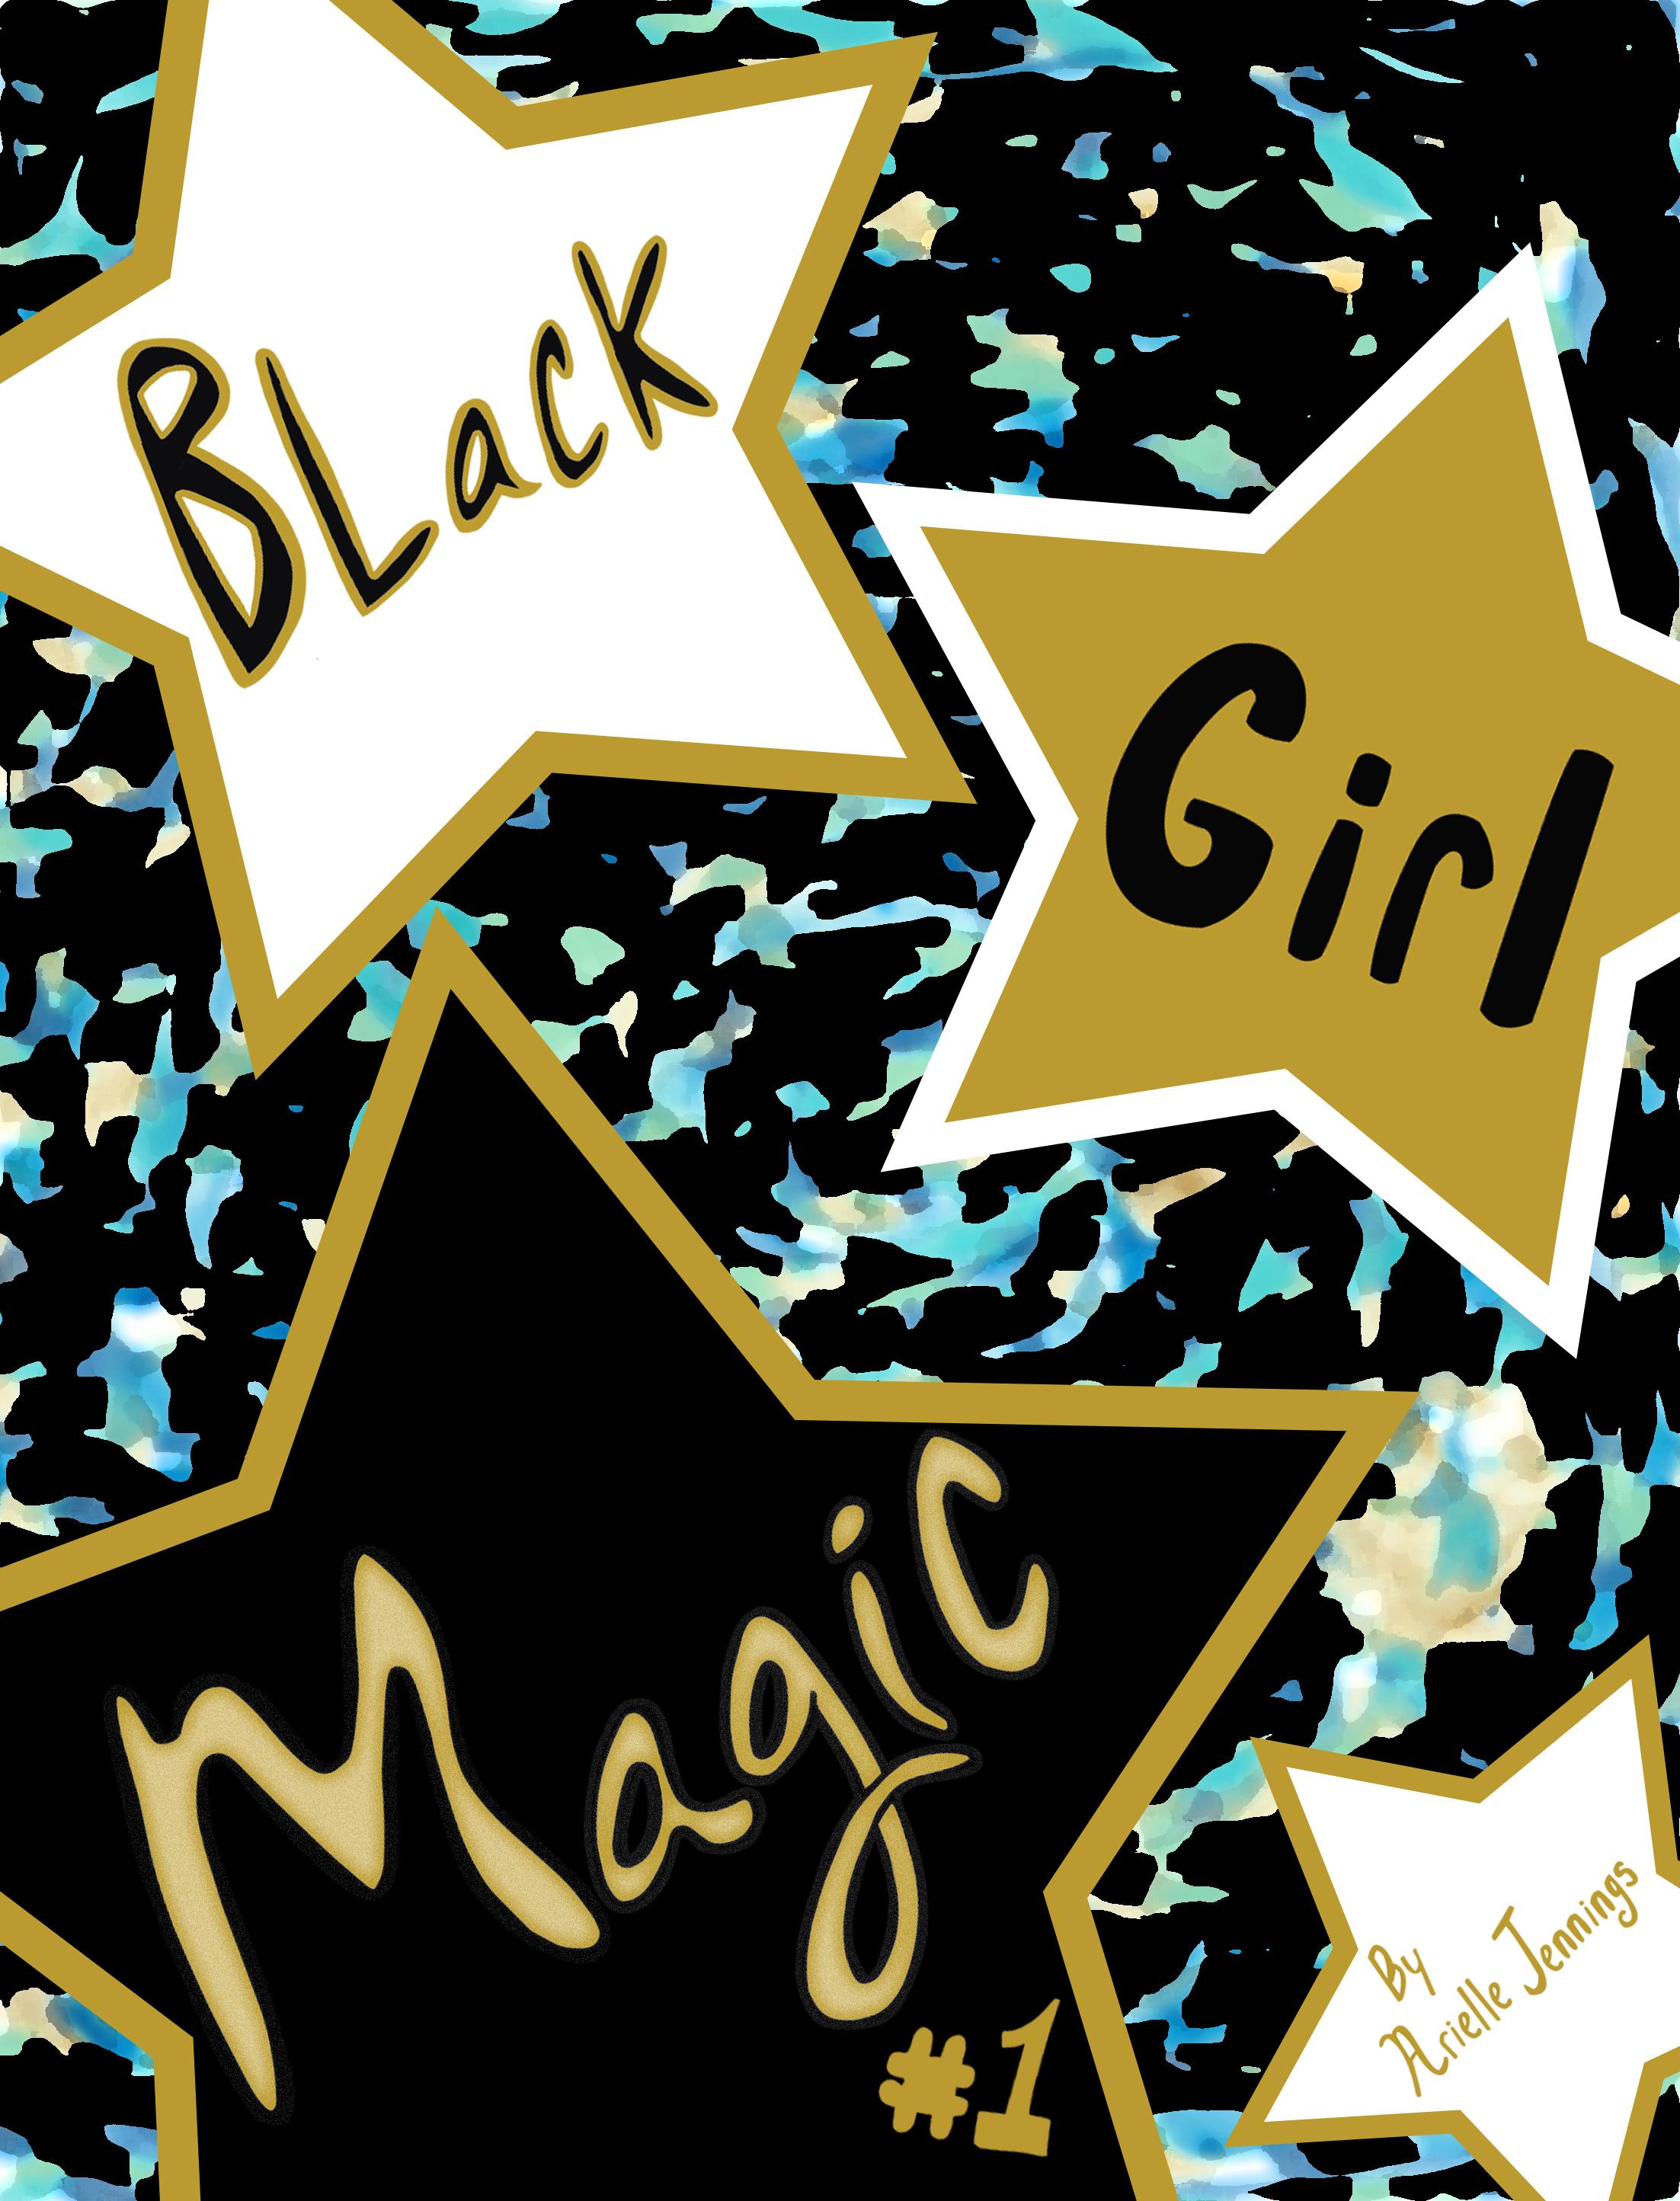 Black Girl Magic Volume 1 Cover